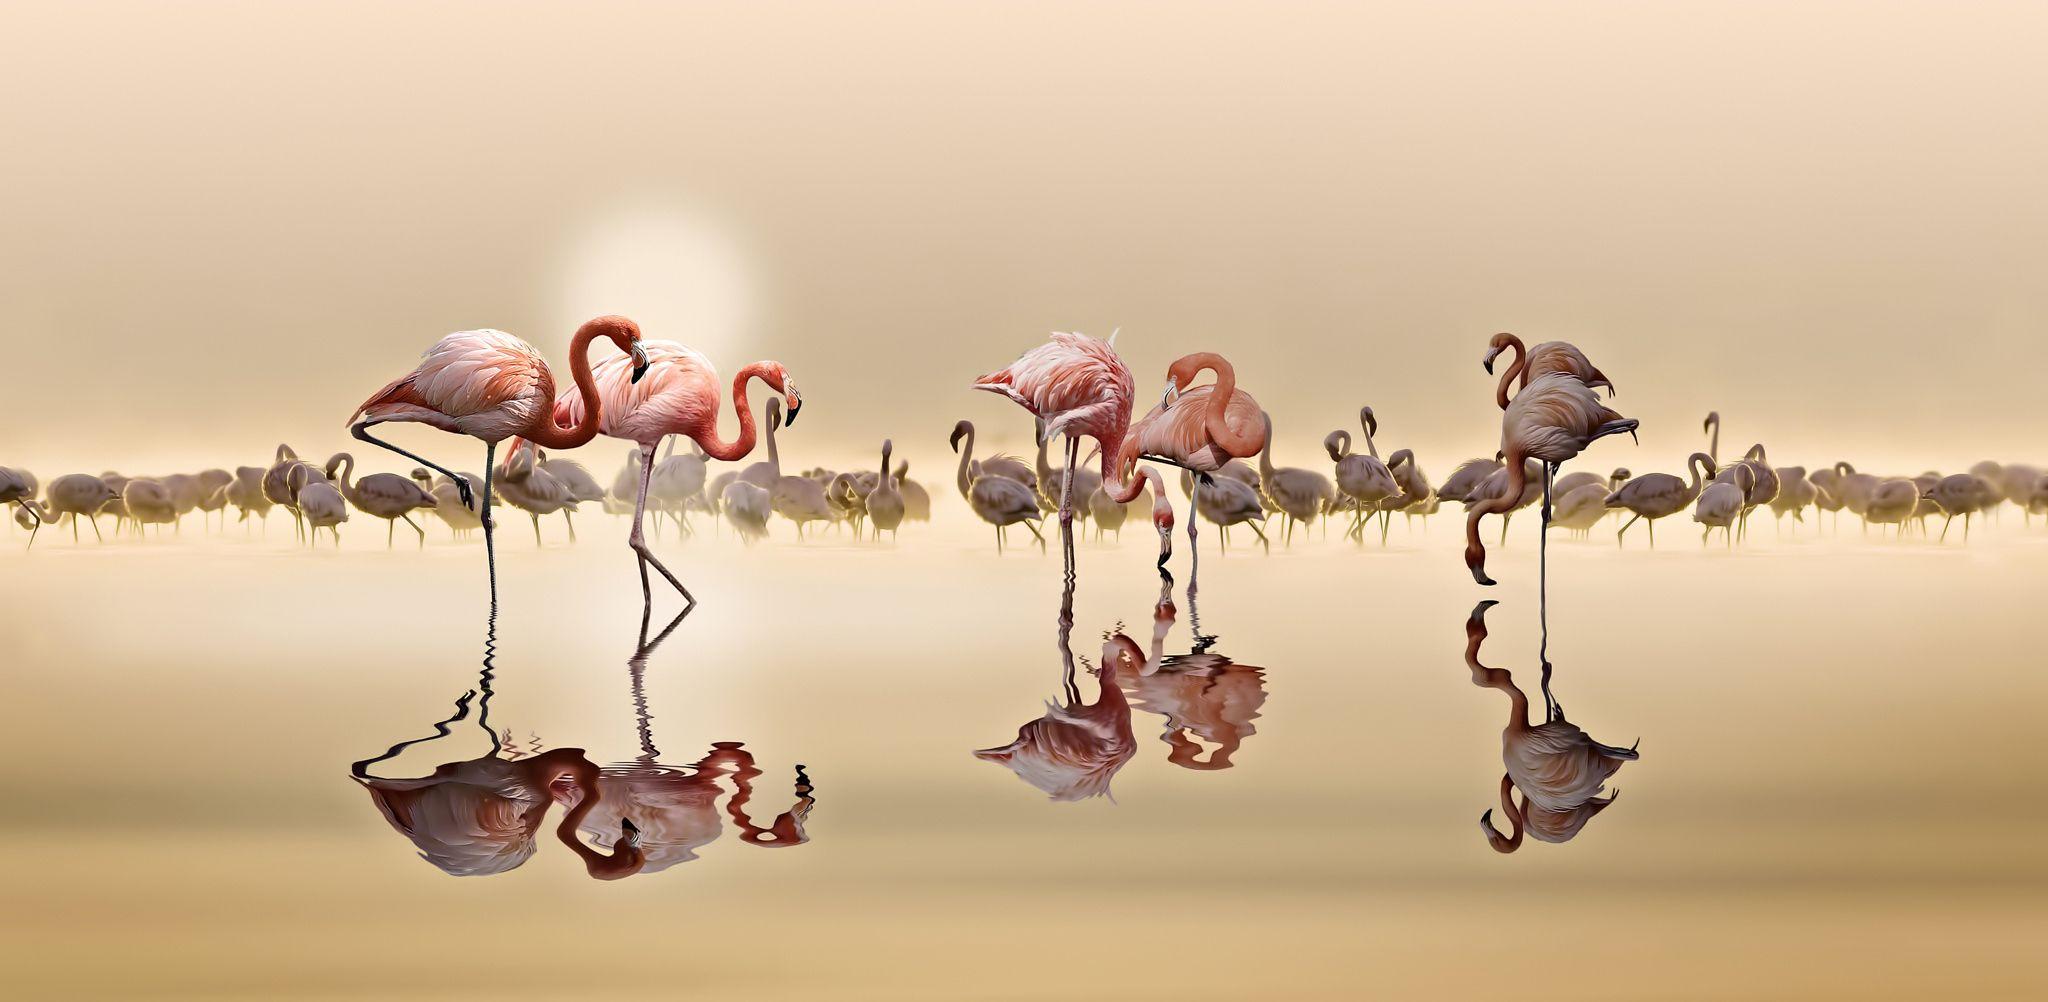 Flamingos - Flamingos as fine art